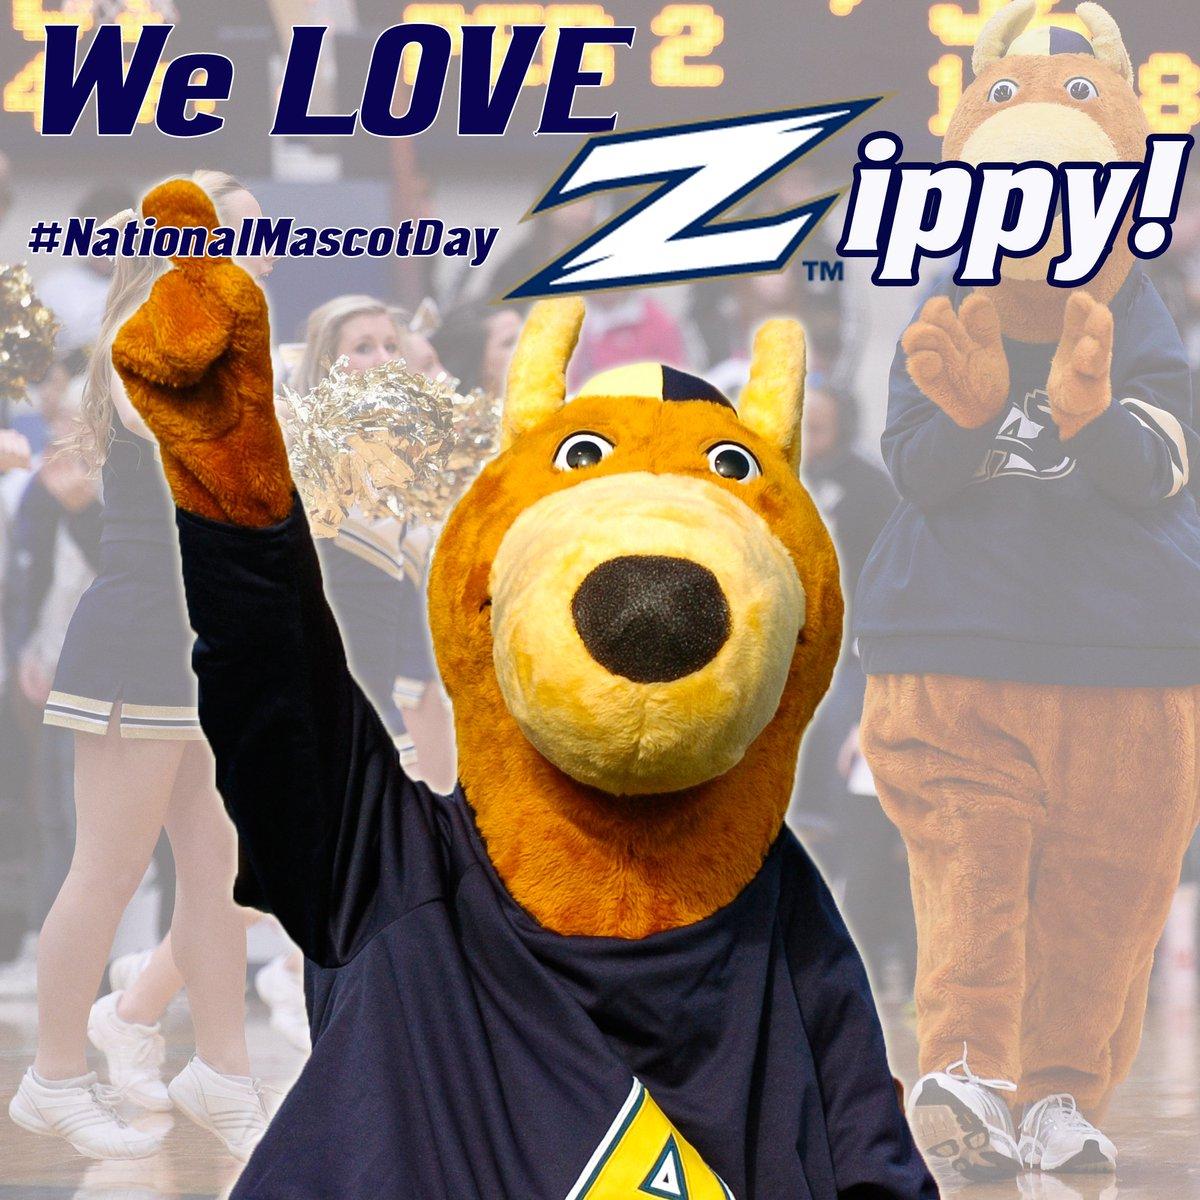 akron zips on twitter the university of akron zips salute zippy